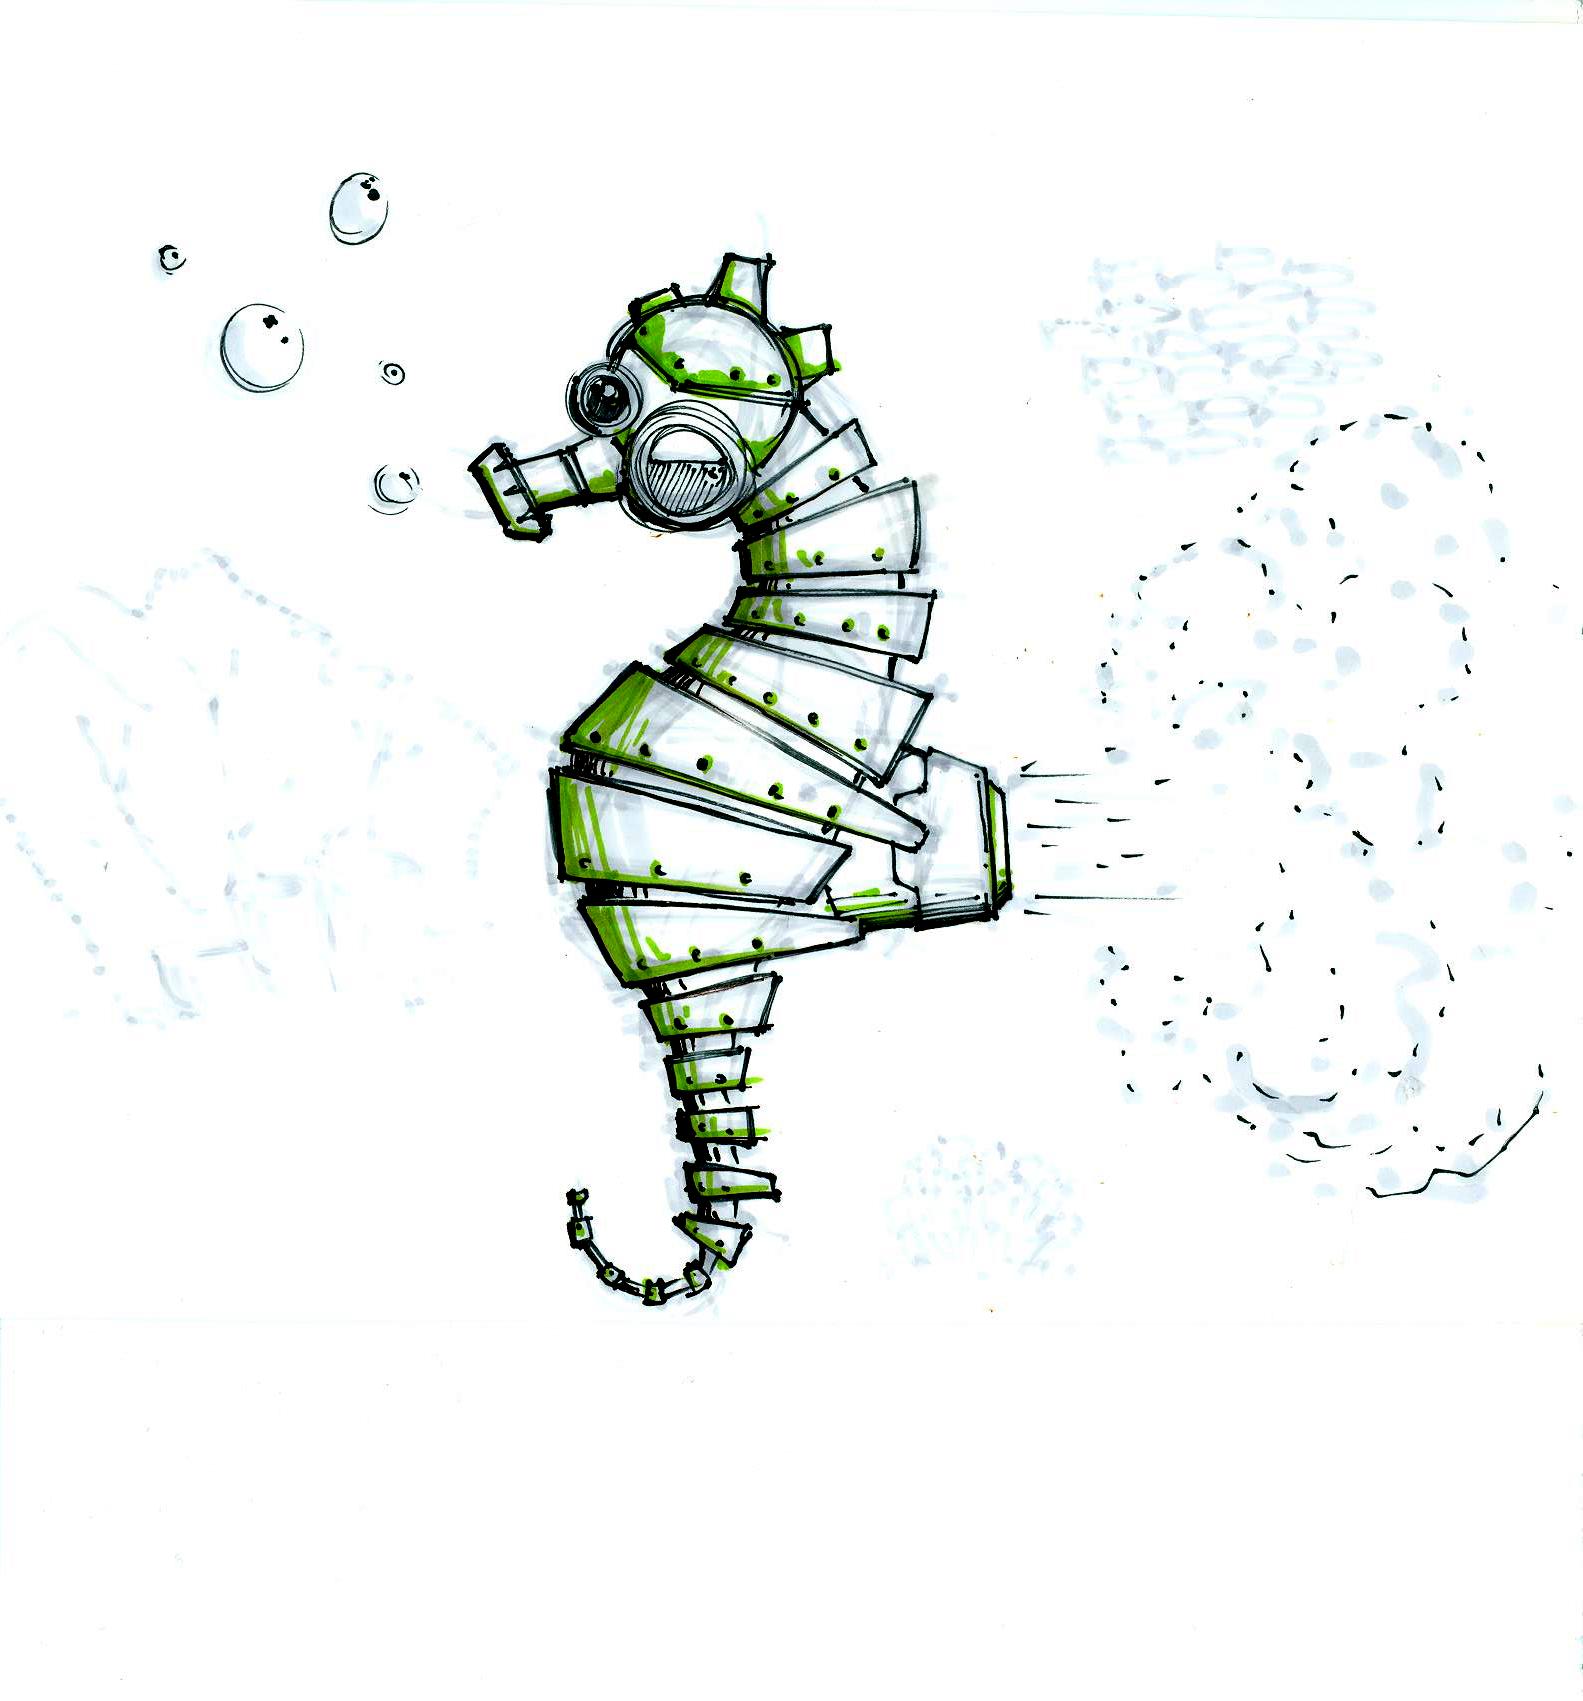 seahorse-robot.png